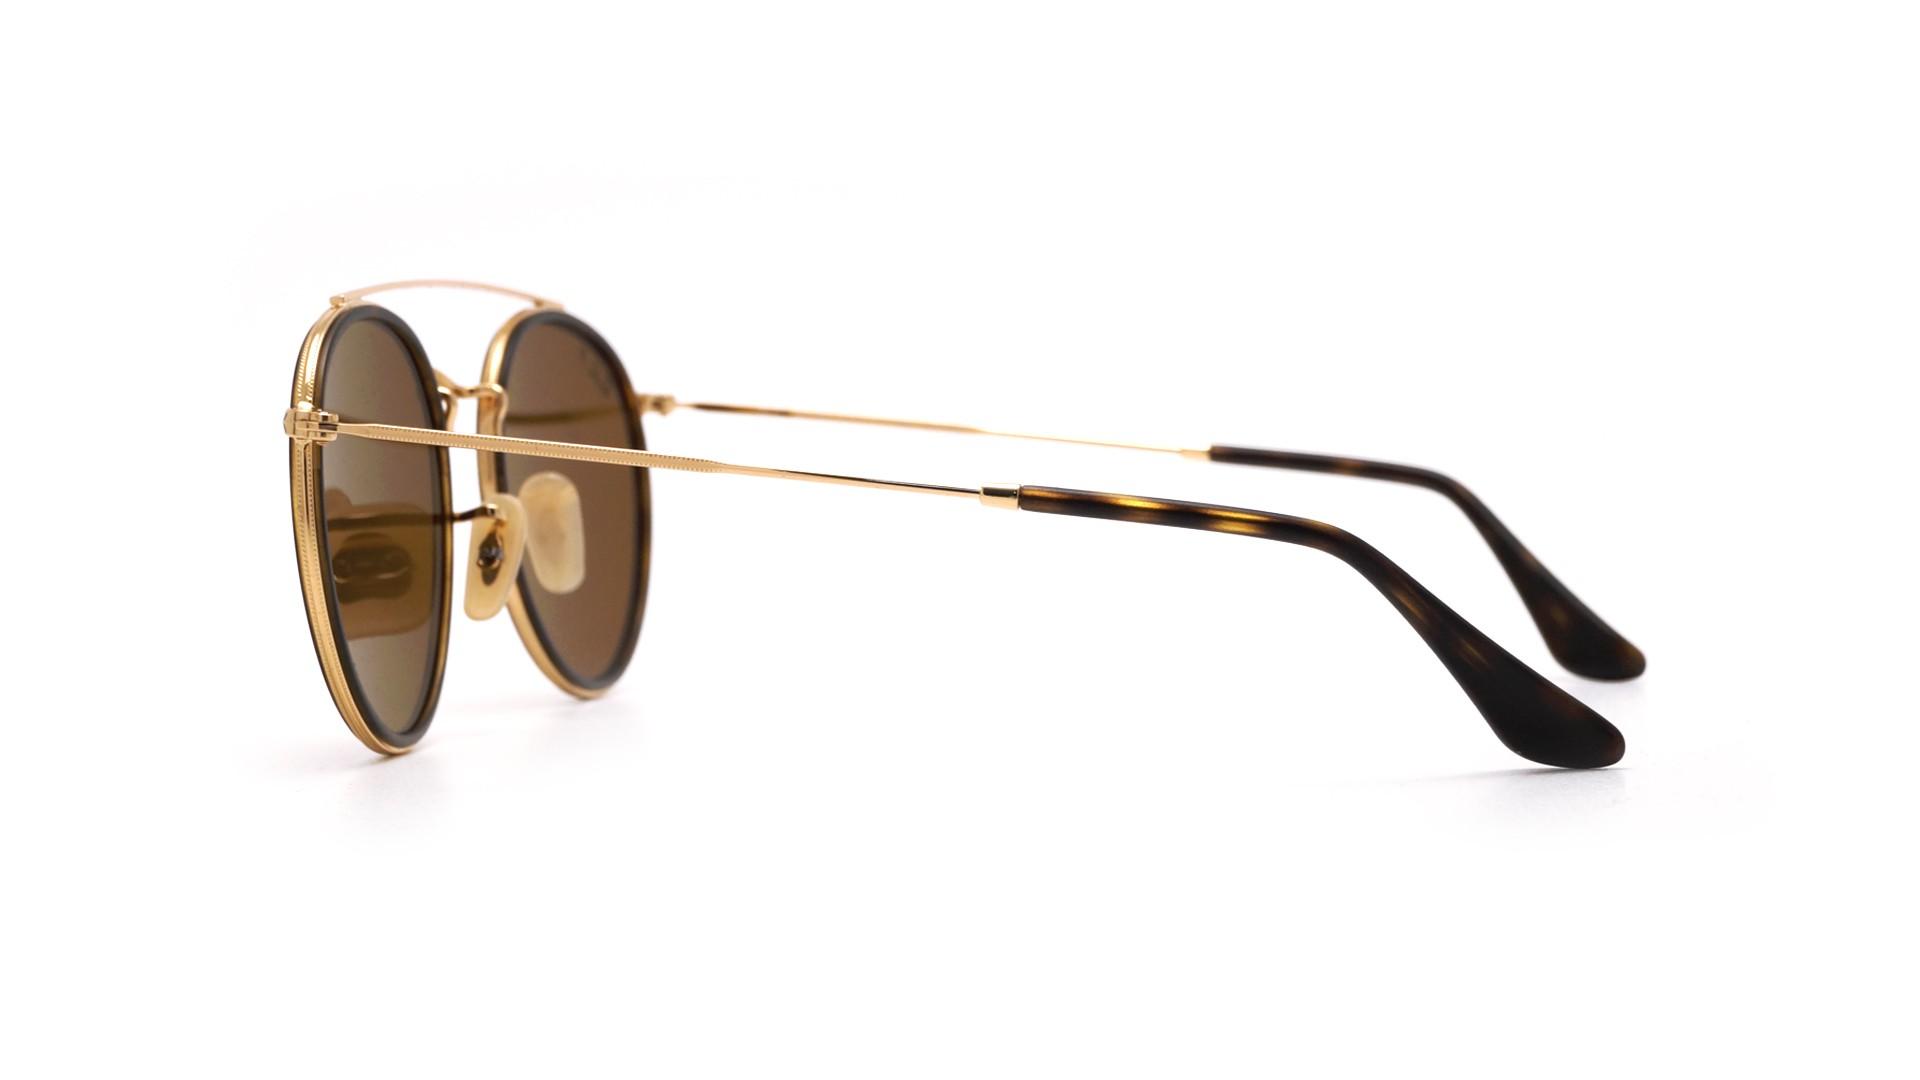 26526de215a Sunglasses Ray-Ban Round Double Bridge Gold RB3647N 001 57 51-22 Medium  Polarized